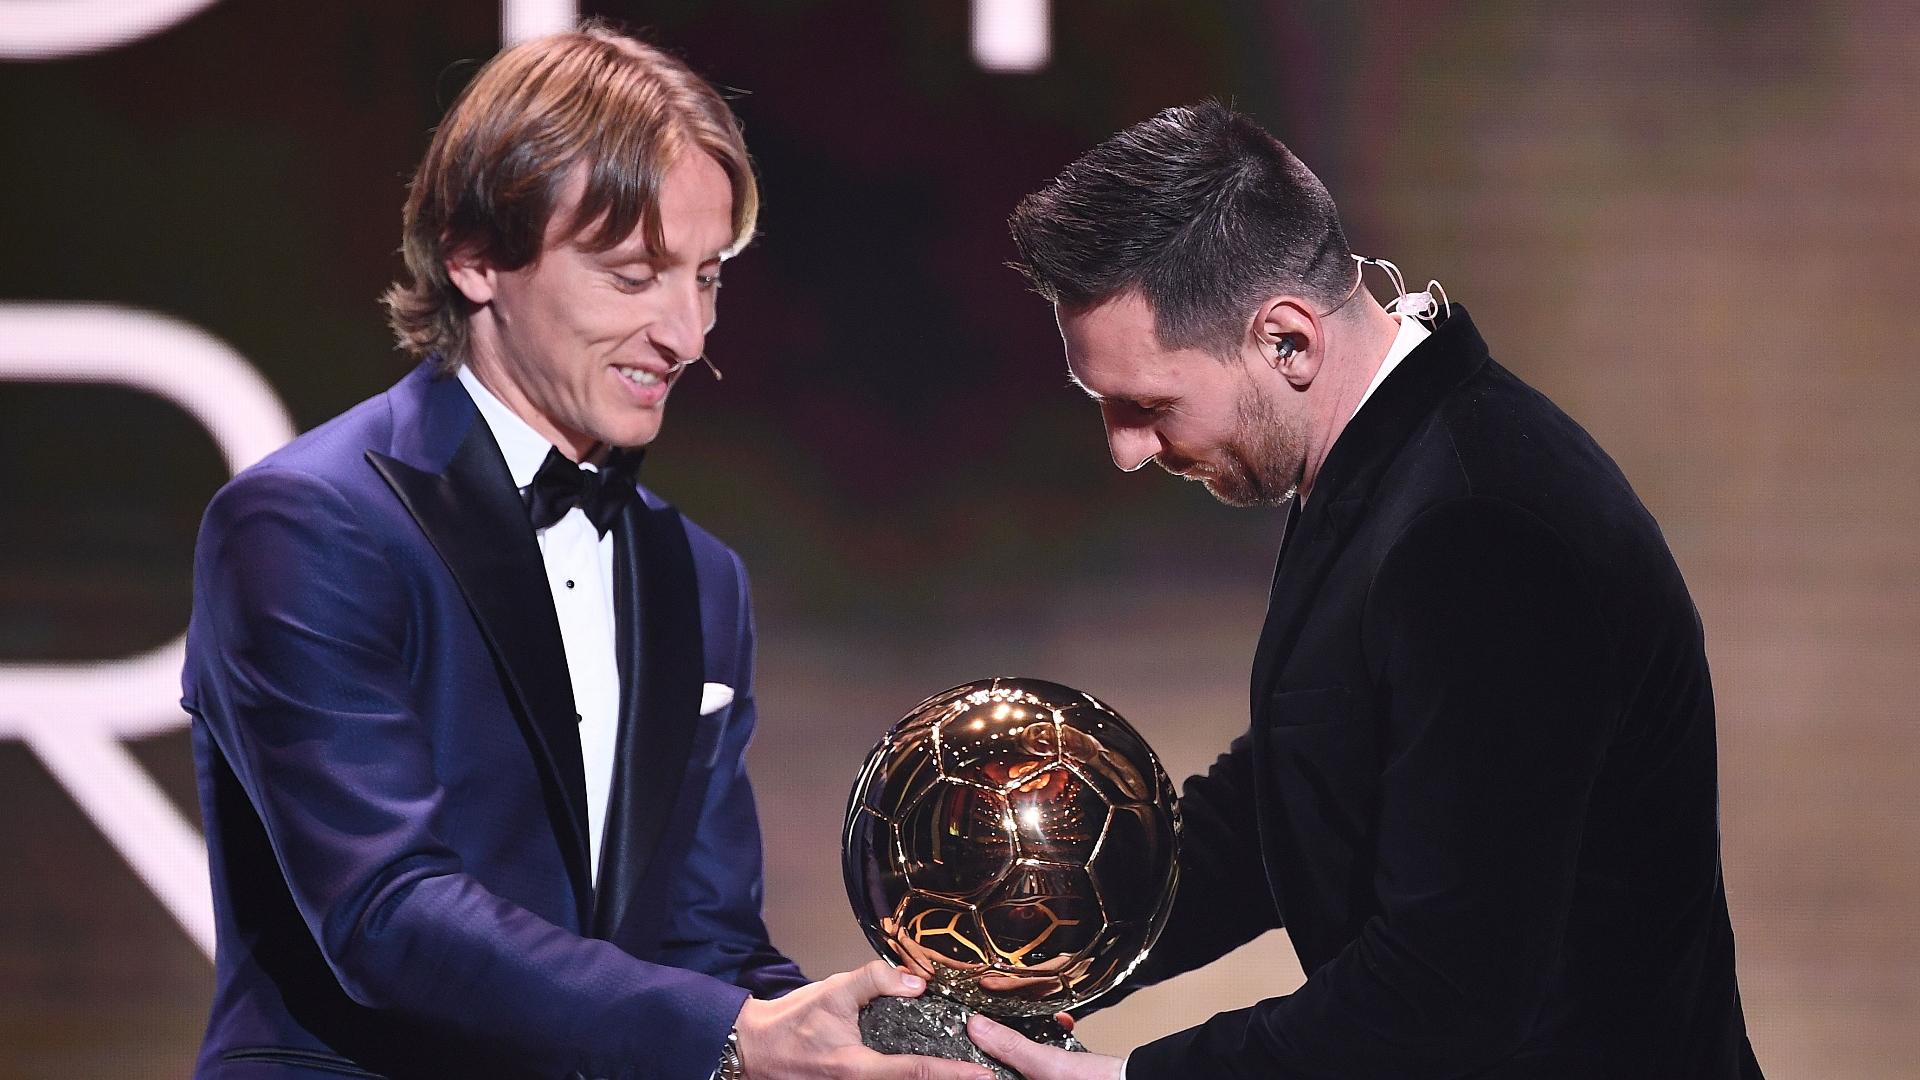 Real Madrid's Modric congratulates Barcelona rival Messi after sixth Ballon d'Or win